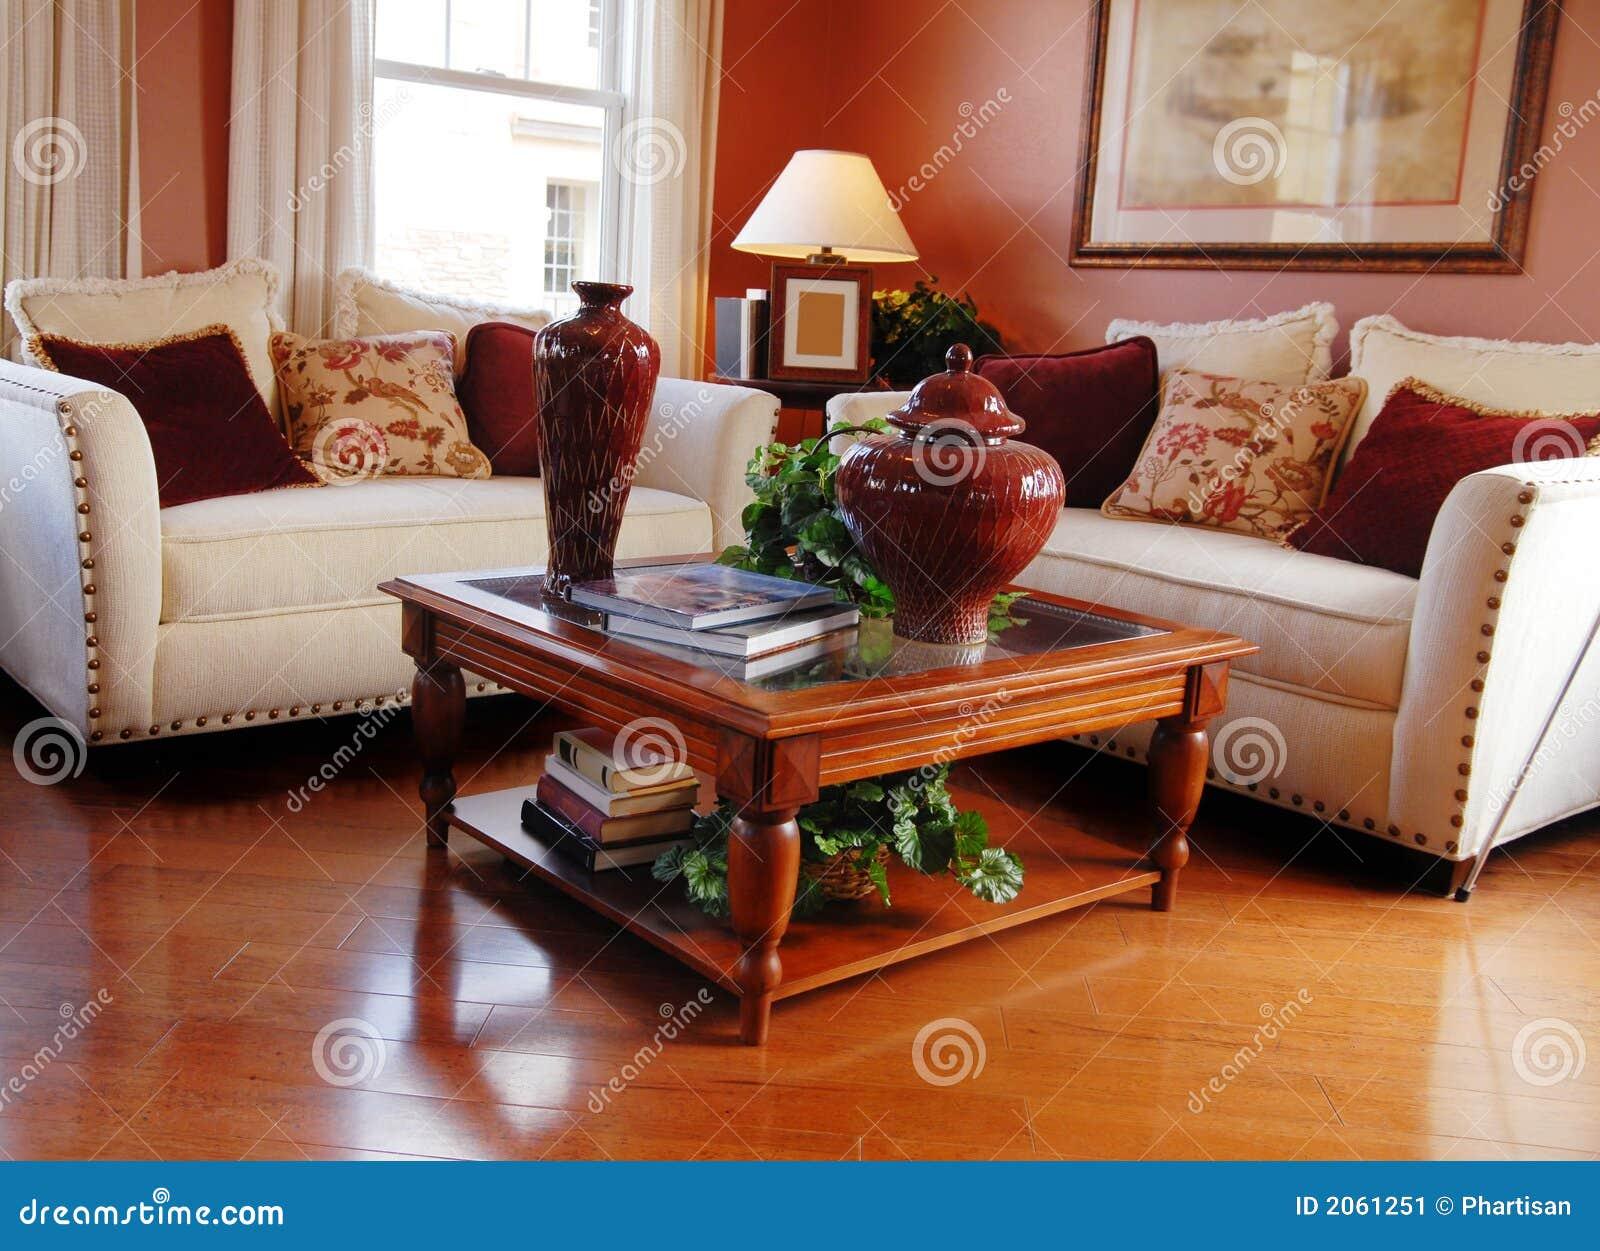 Model Home Interior model home interior design stock image - image: 2061261